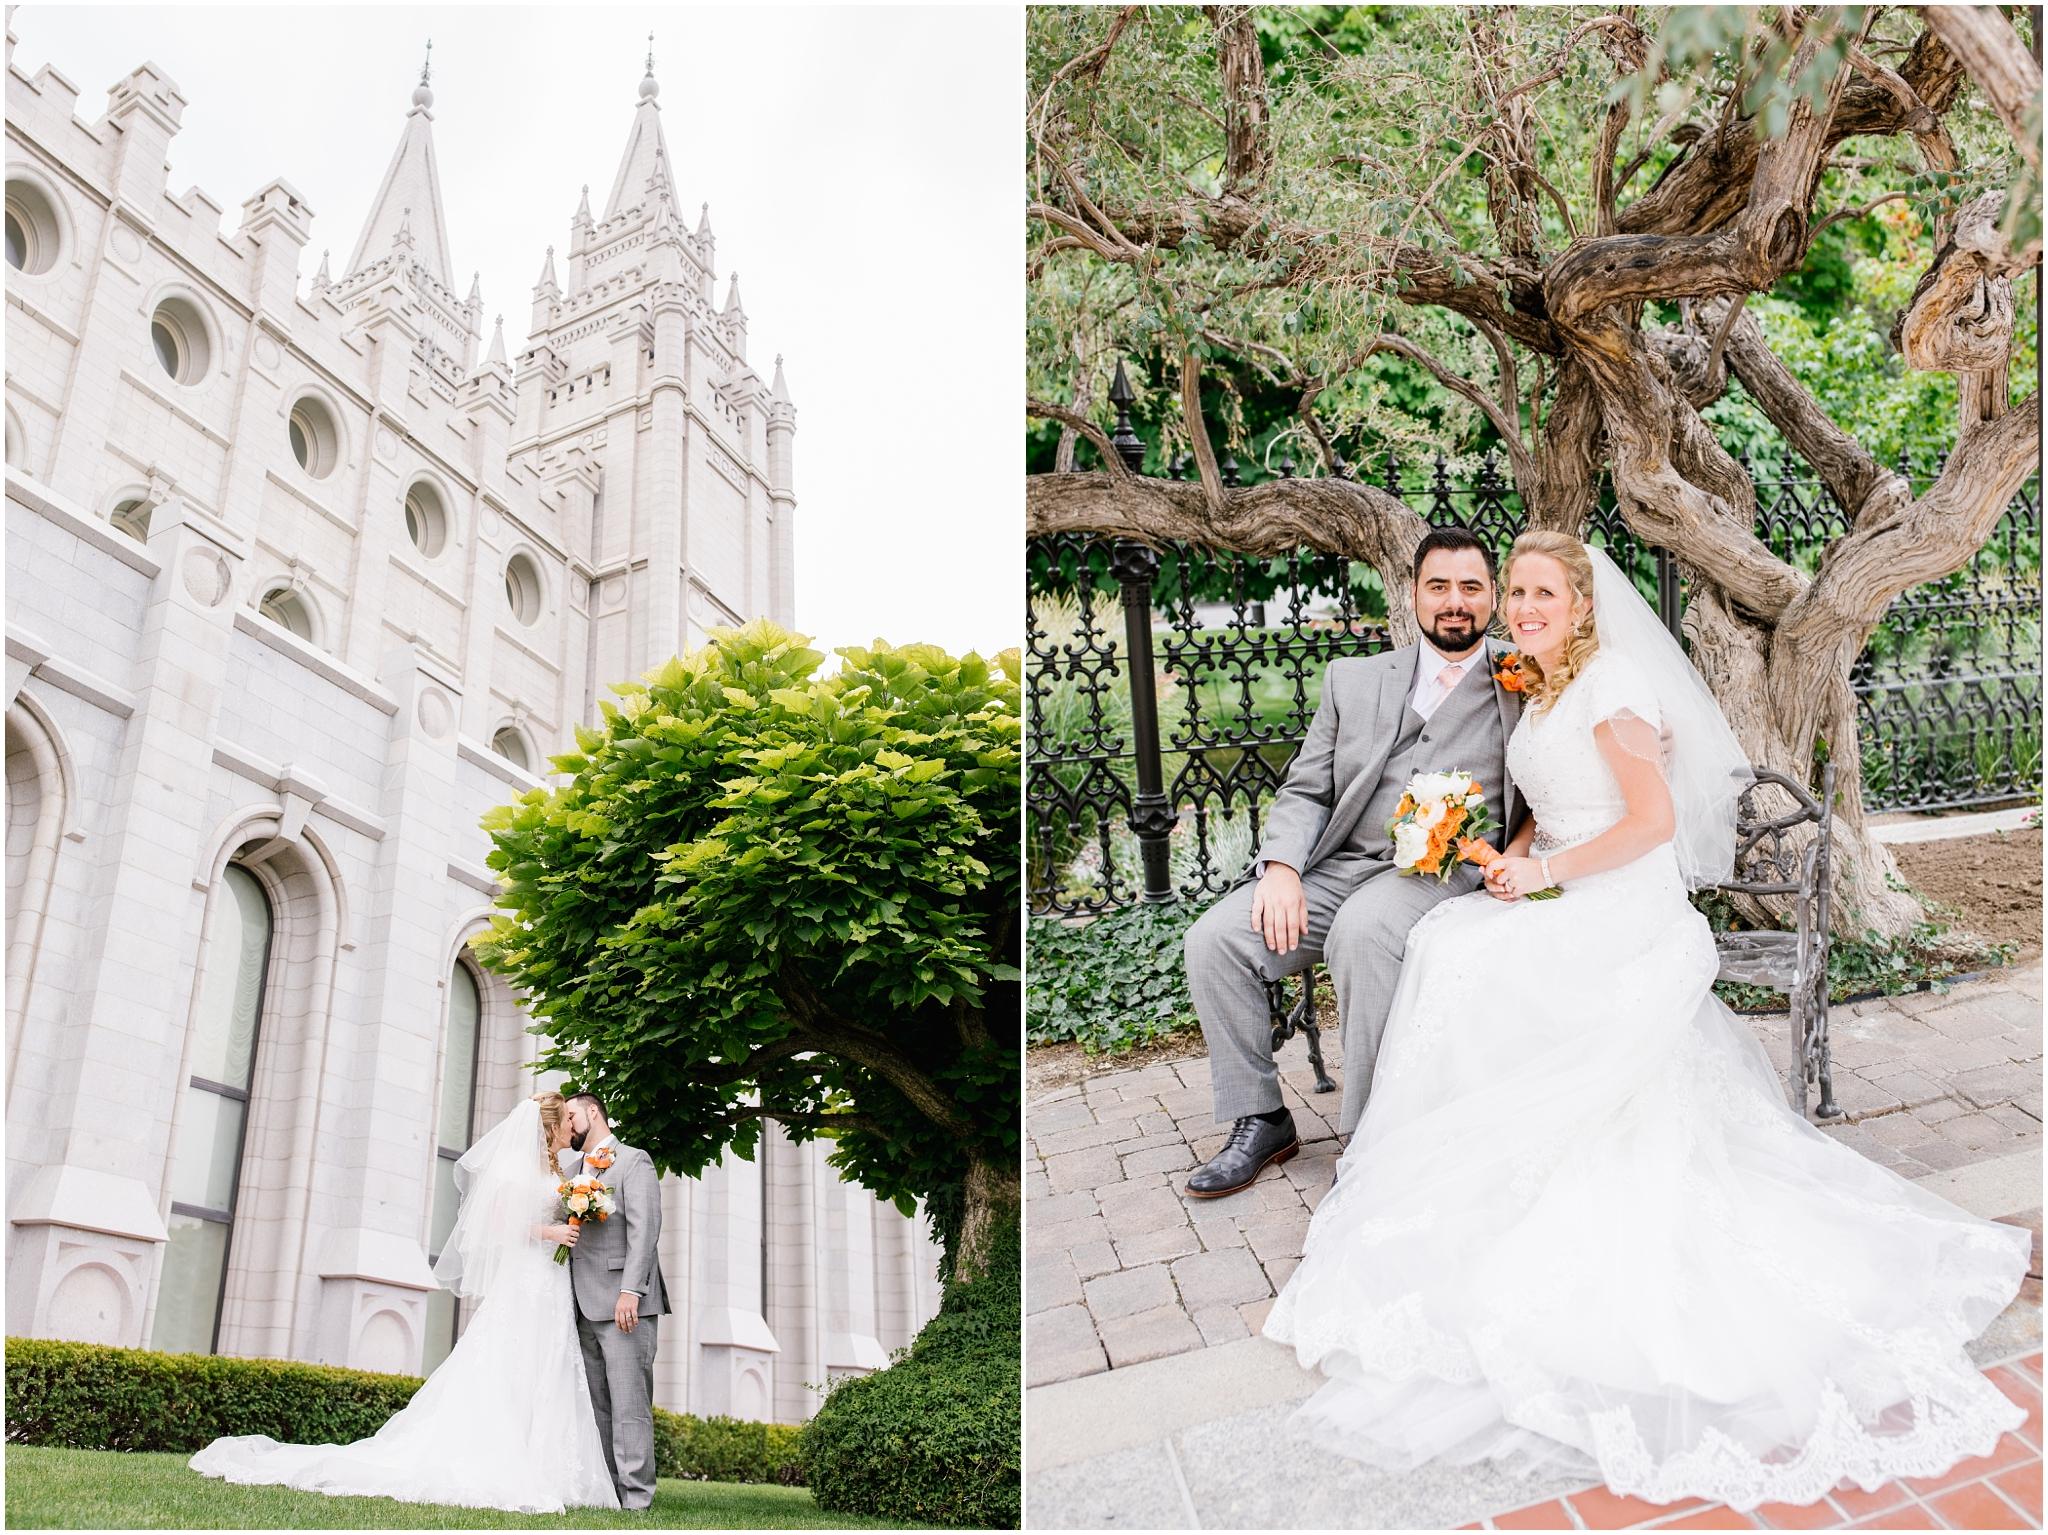 Justin and Melissa-170_Lizzie-B-Imagery-Utah-Wedding-Photographer-Salt-Lake-City-Temple-The-Grand-Ballroom.jpg